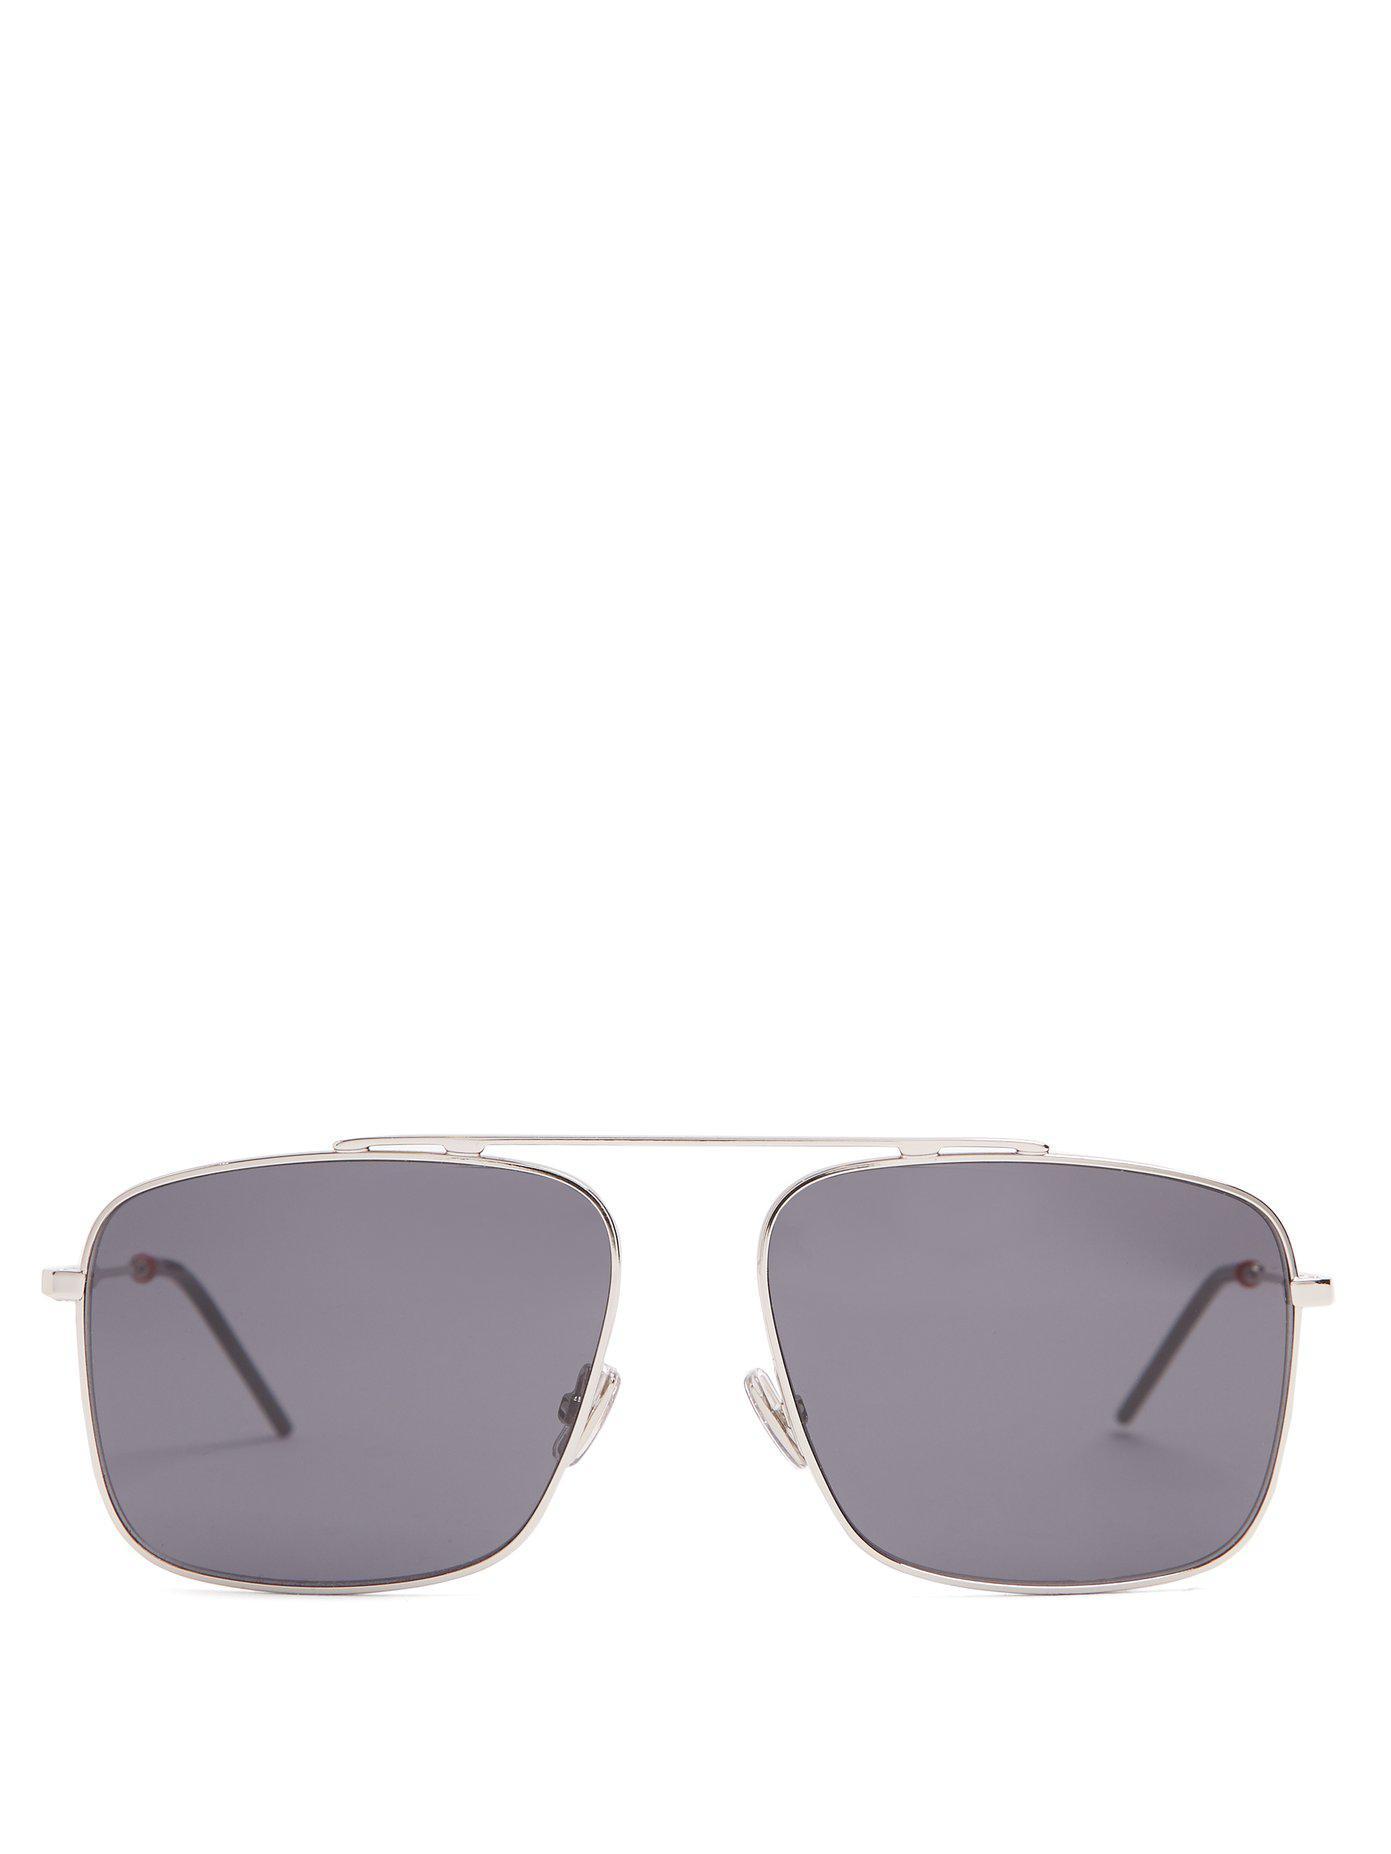 ba9d9e1d1b1e3 Silver Hardior Shield Sunglasses Dior homme Dior and Products